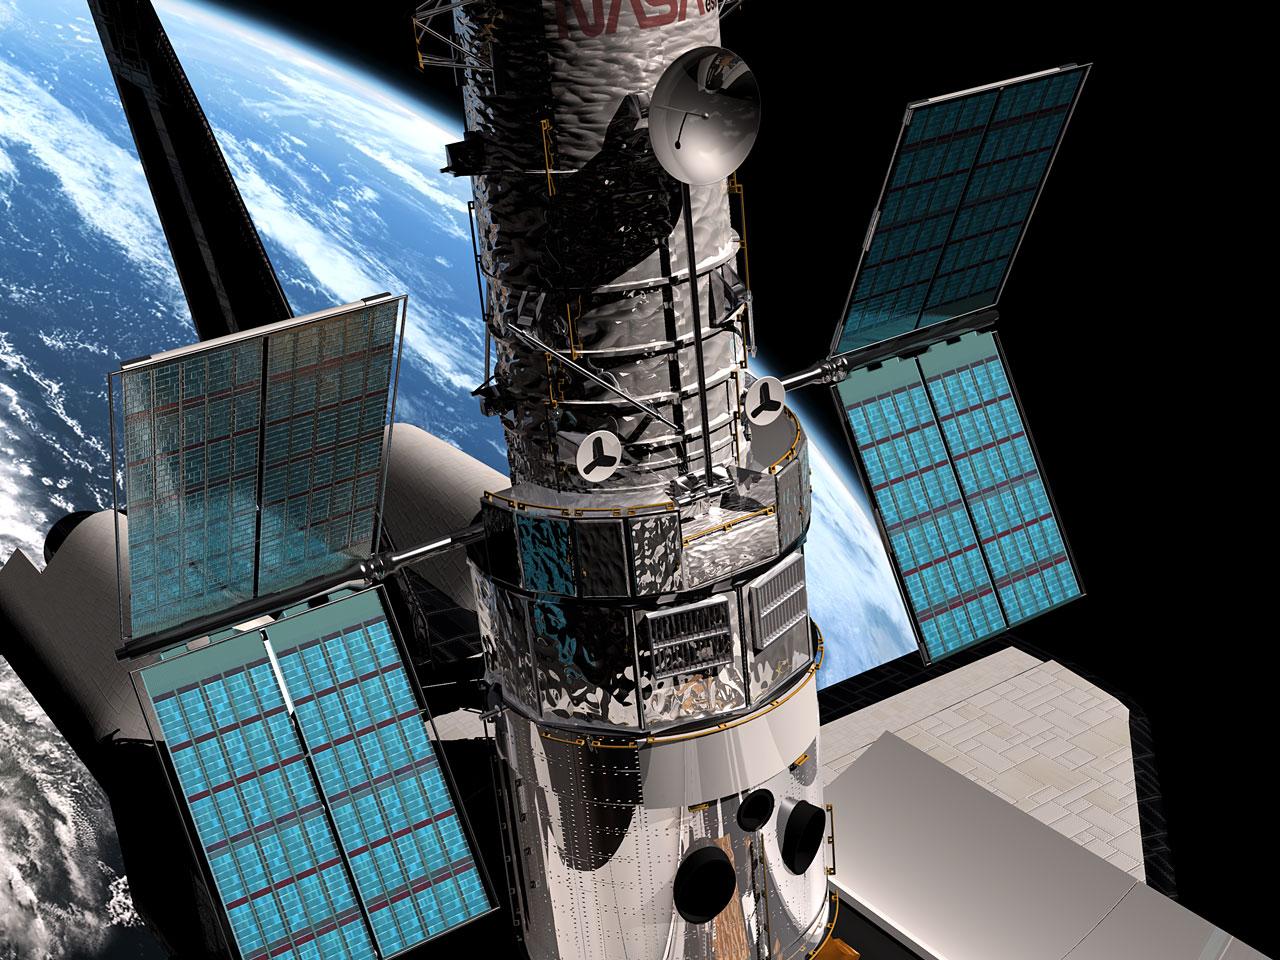 SM3B - Hubble's solar panels unfolding